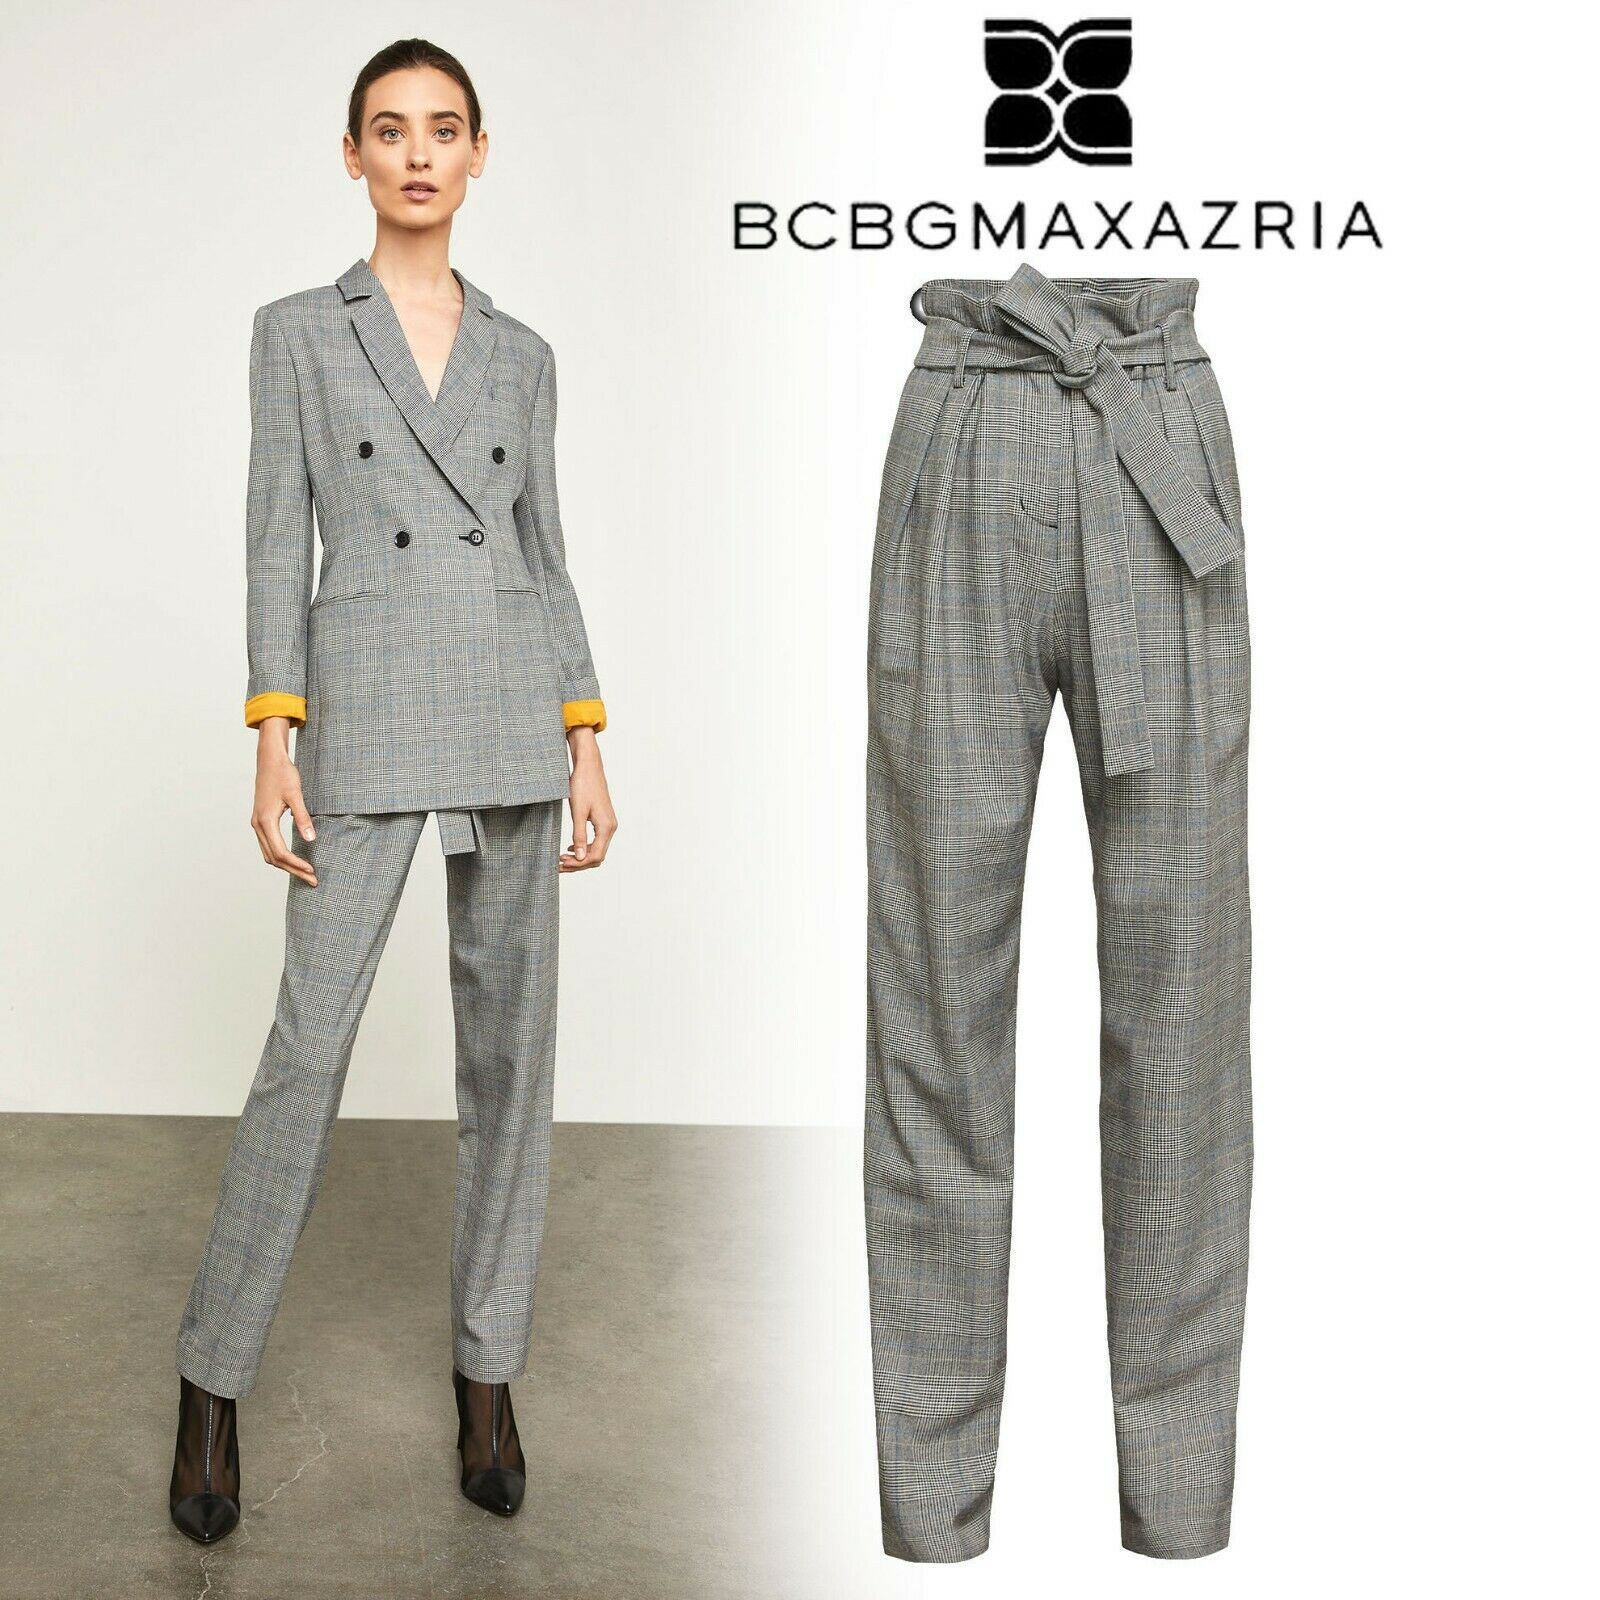 BCBGMAXAZRIA Womens Houndstooth Paperbag Waist Pleated Trouser